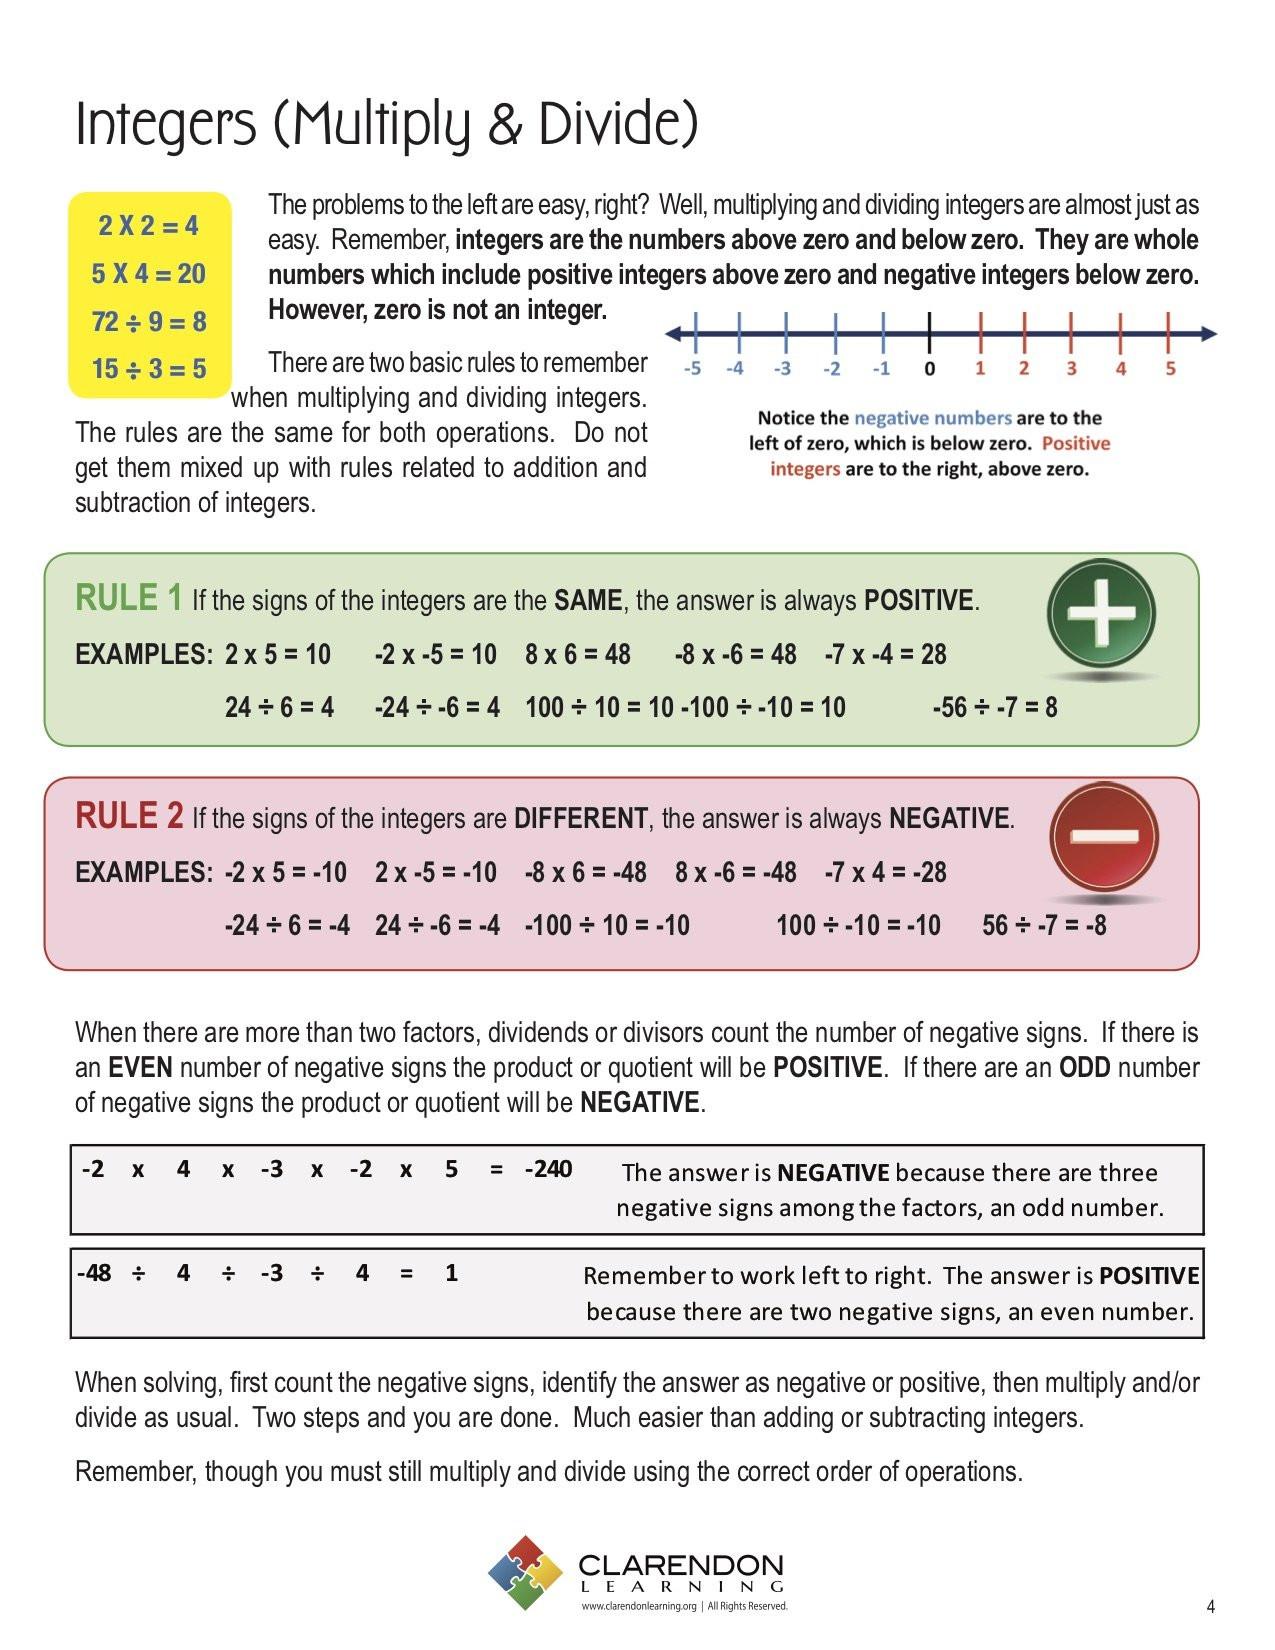 Multiplying and Dividing Integers Worksheet Integers Multiply & Divide Lesson Plan